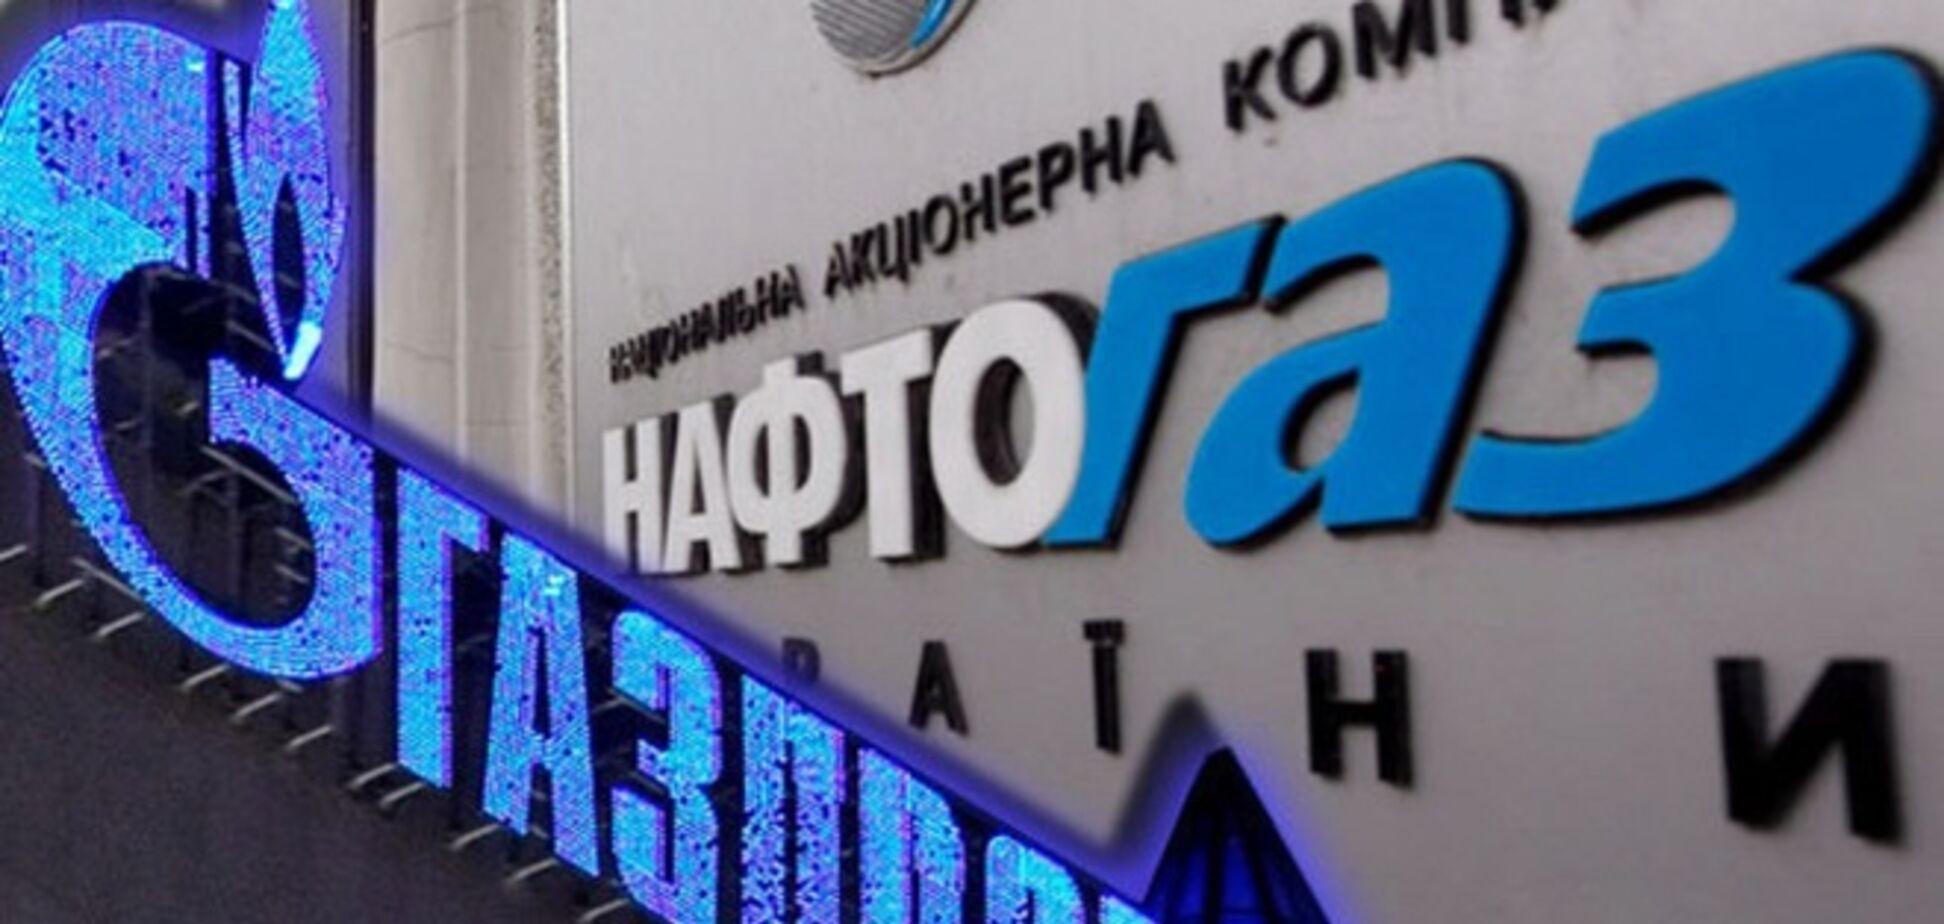 'Нафтогаз' вернул 'Газпрому' переплату за транзит газа